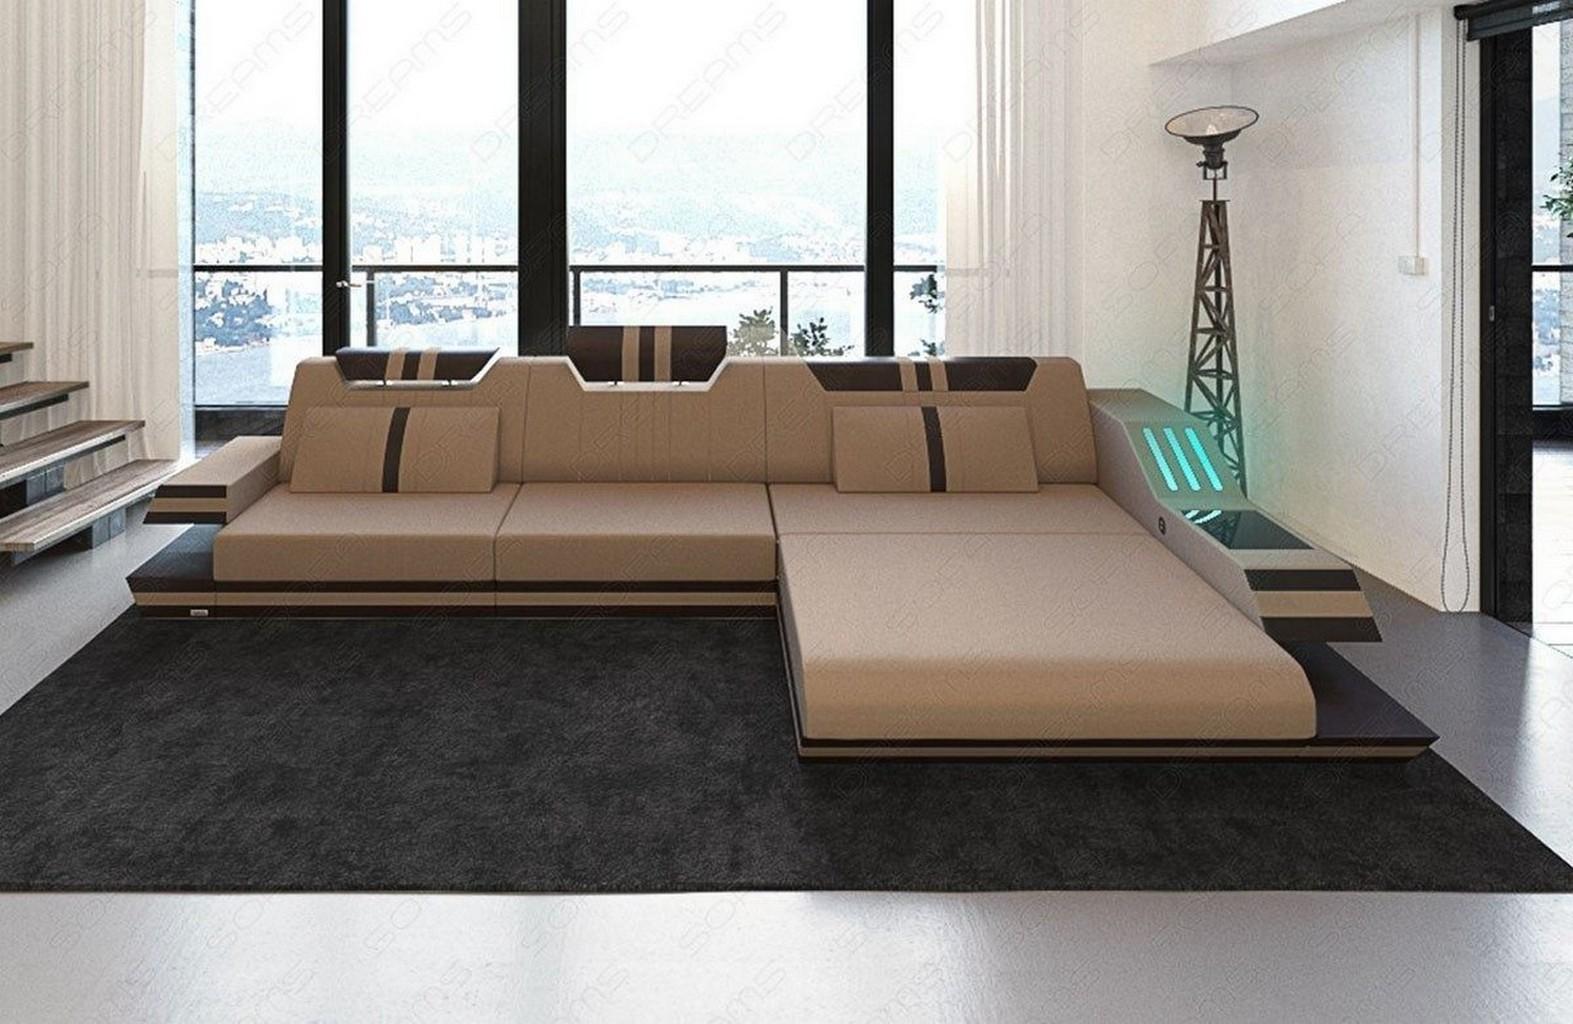 designer eckcouch ravenna l beige stoffsofa mit led beleuchtung im materialmix ebay. Black Bedroom Furniture Sets. Home Design Ideas